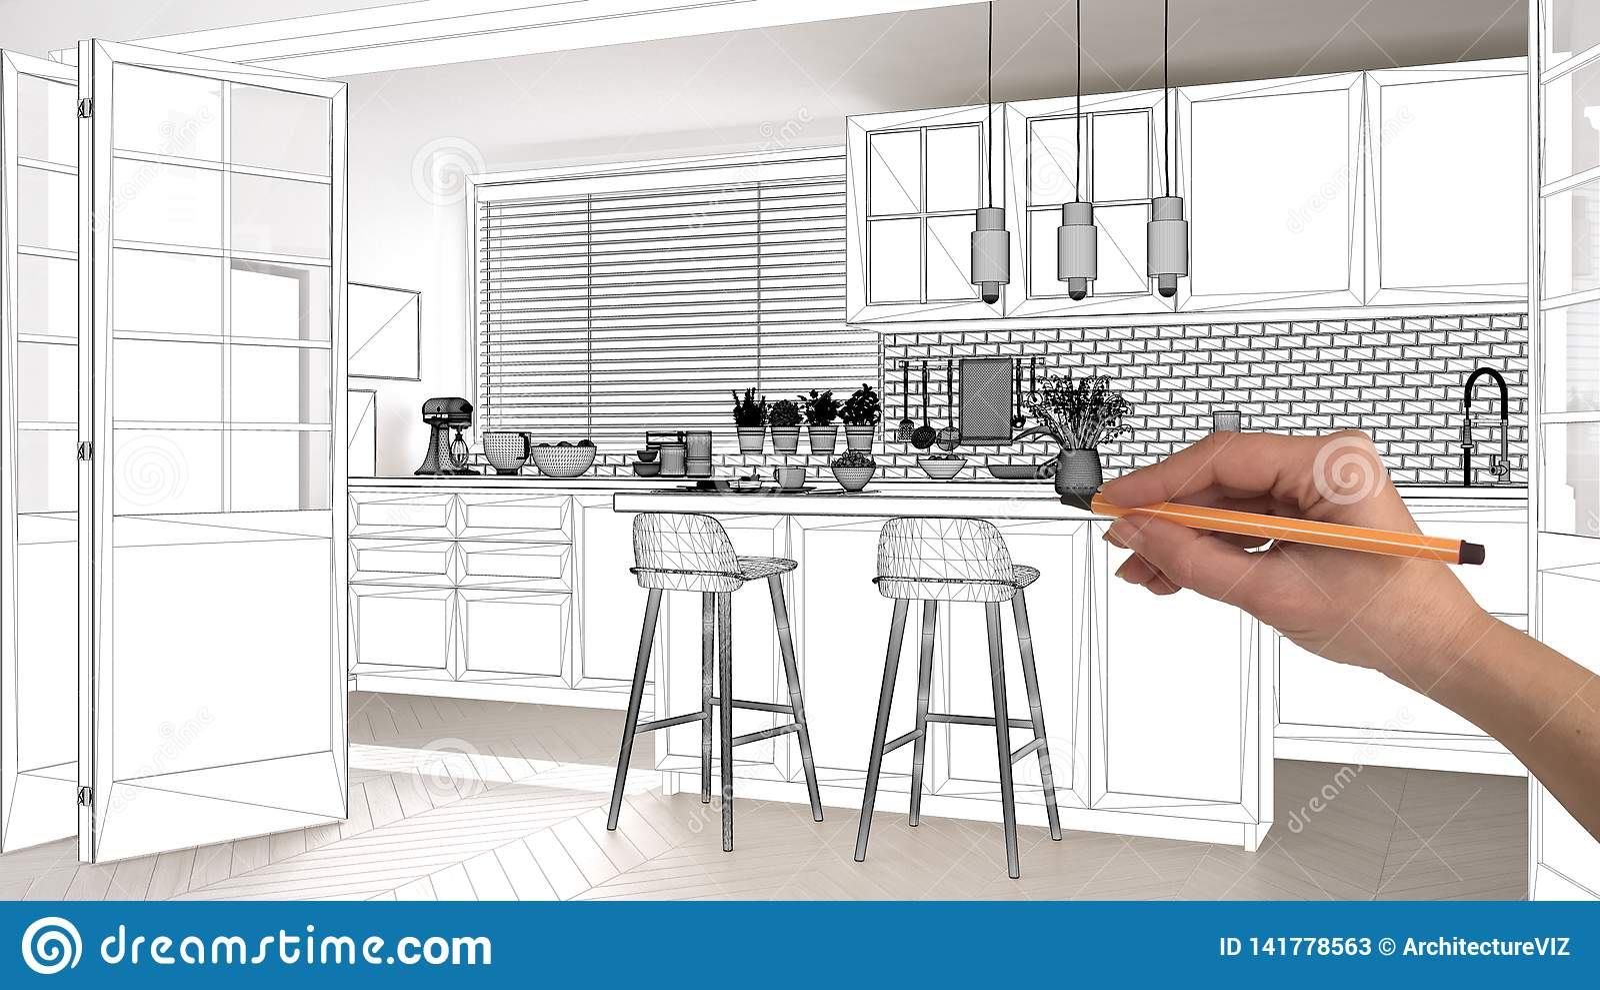 Unfinished Project Under Construction Draft Concept Interior Design Sketch Hand Drawing Scandinavian Kitchen Blueprint Sketch Stock Image Image Of Development Idea 141778563